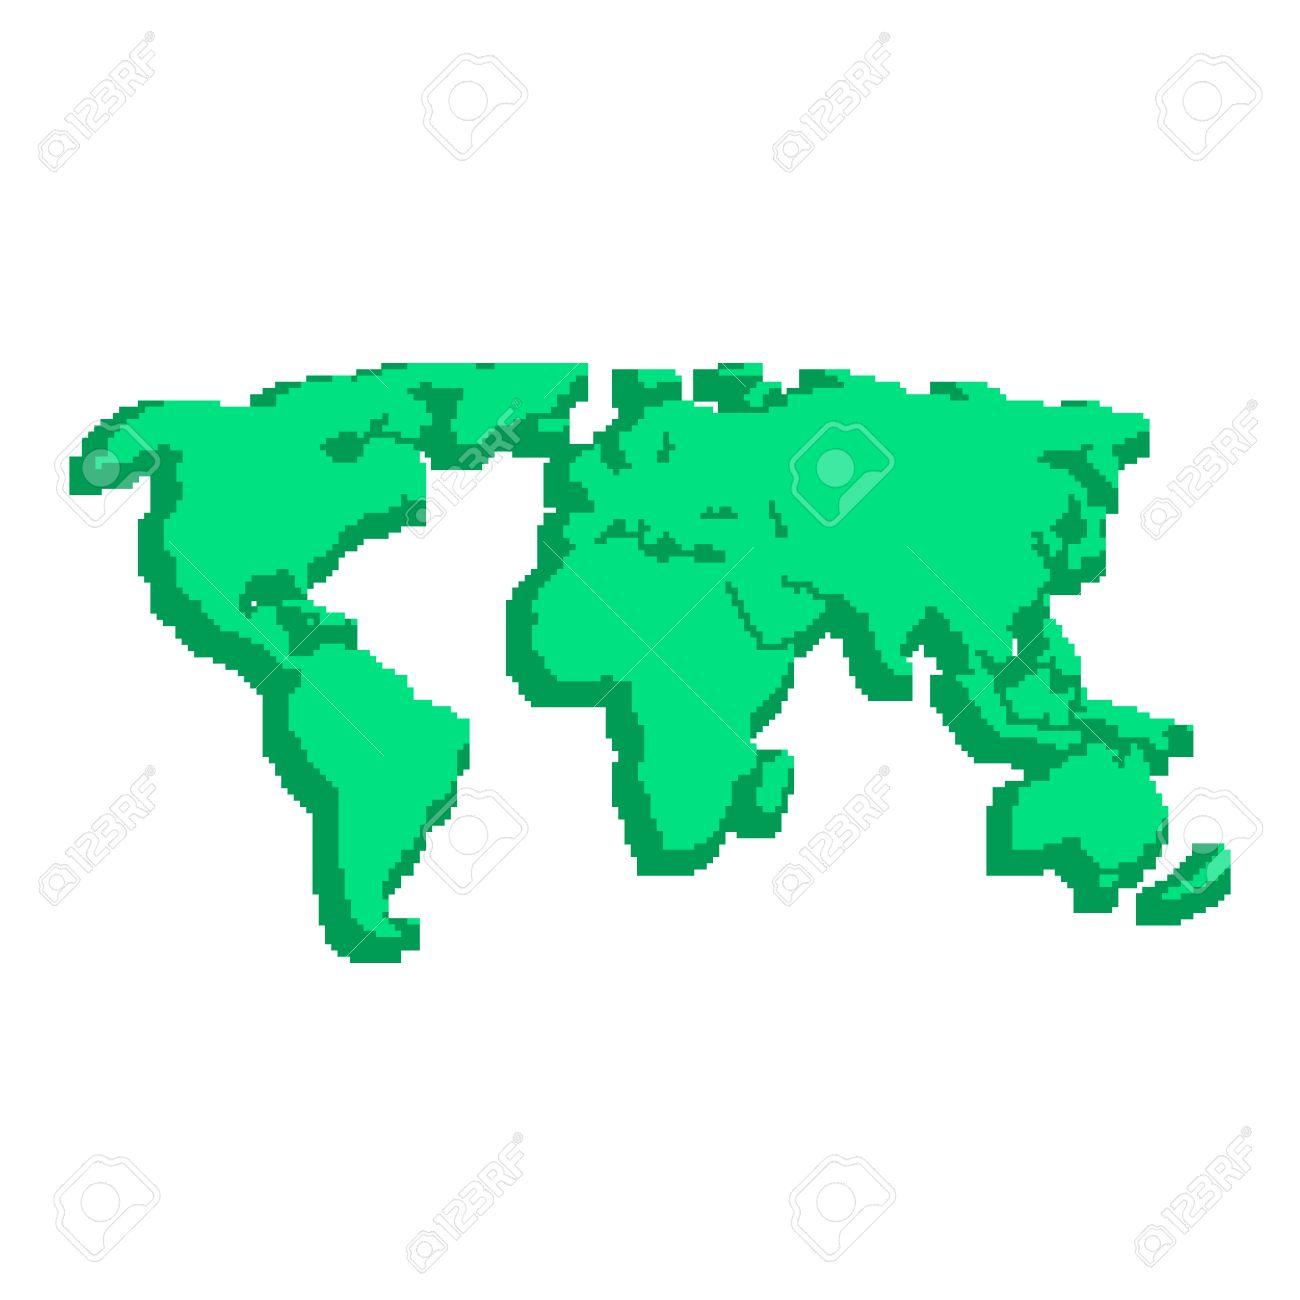 Green 3d World Map Like Pix Elements Concept Of Locations 8bit